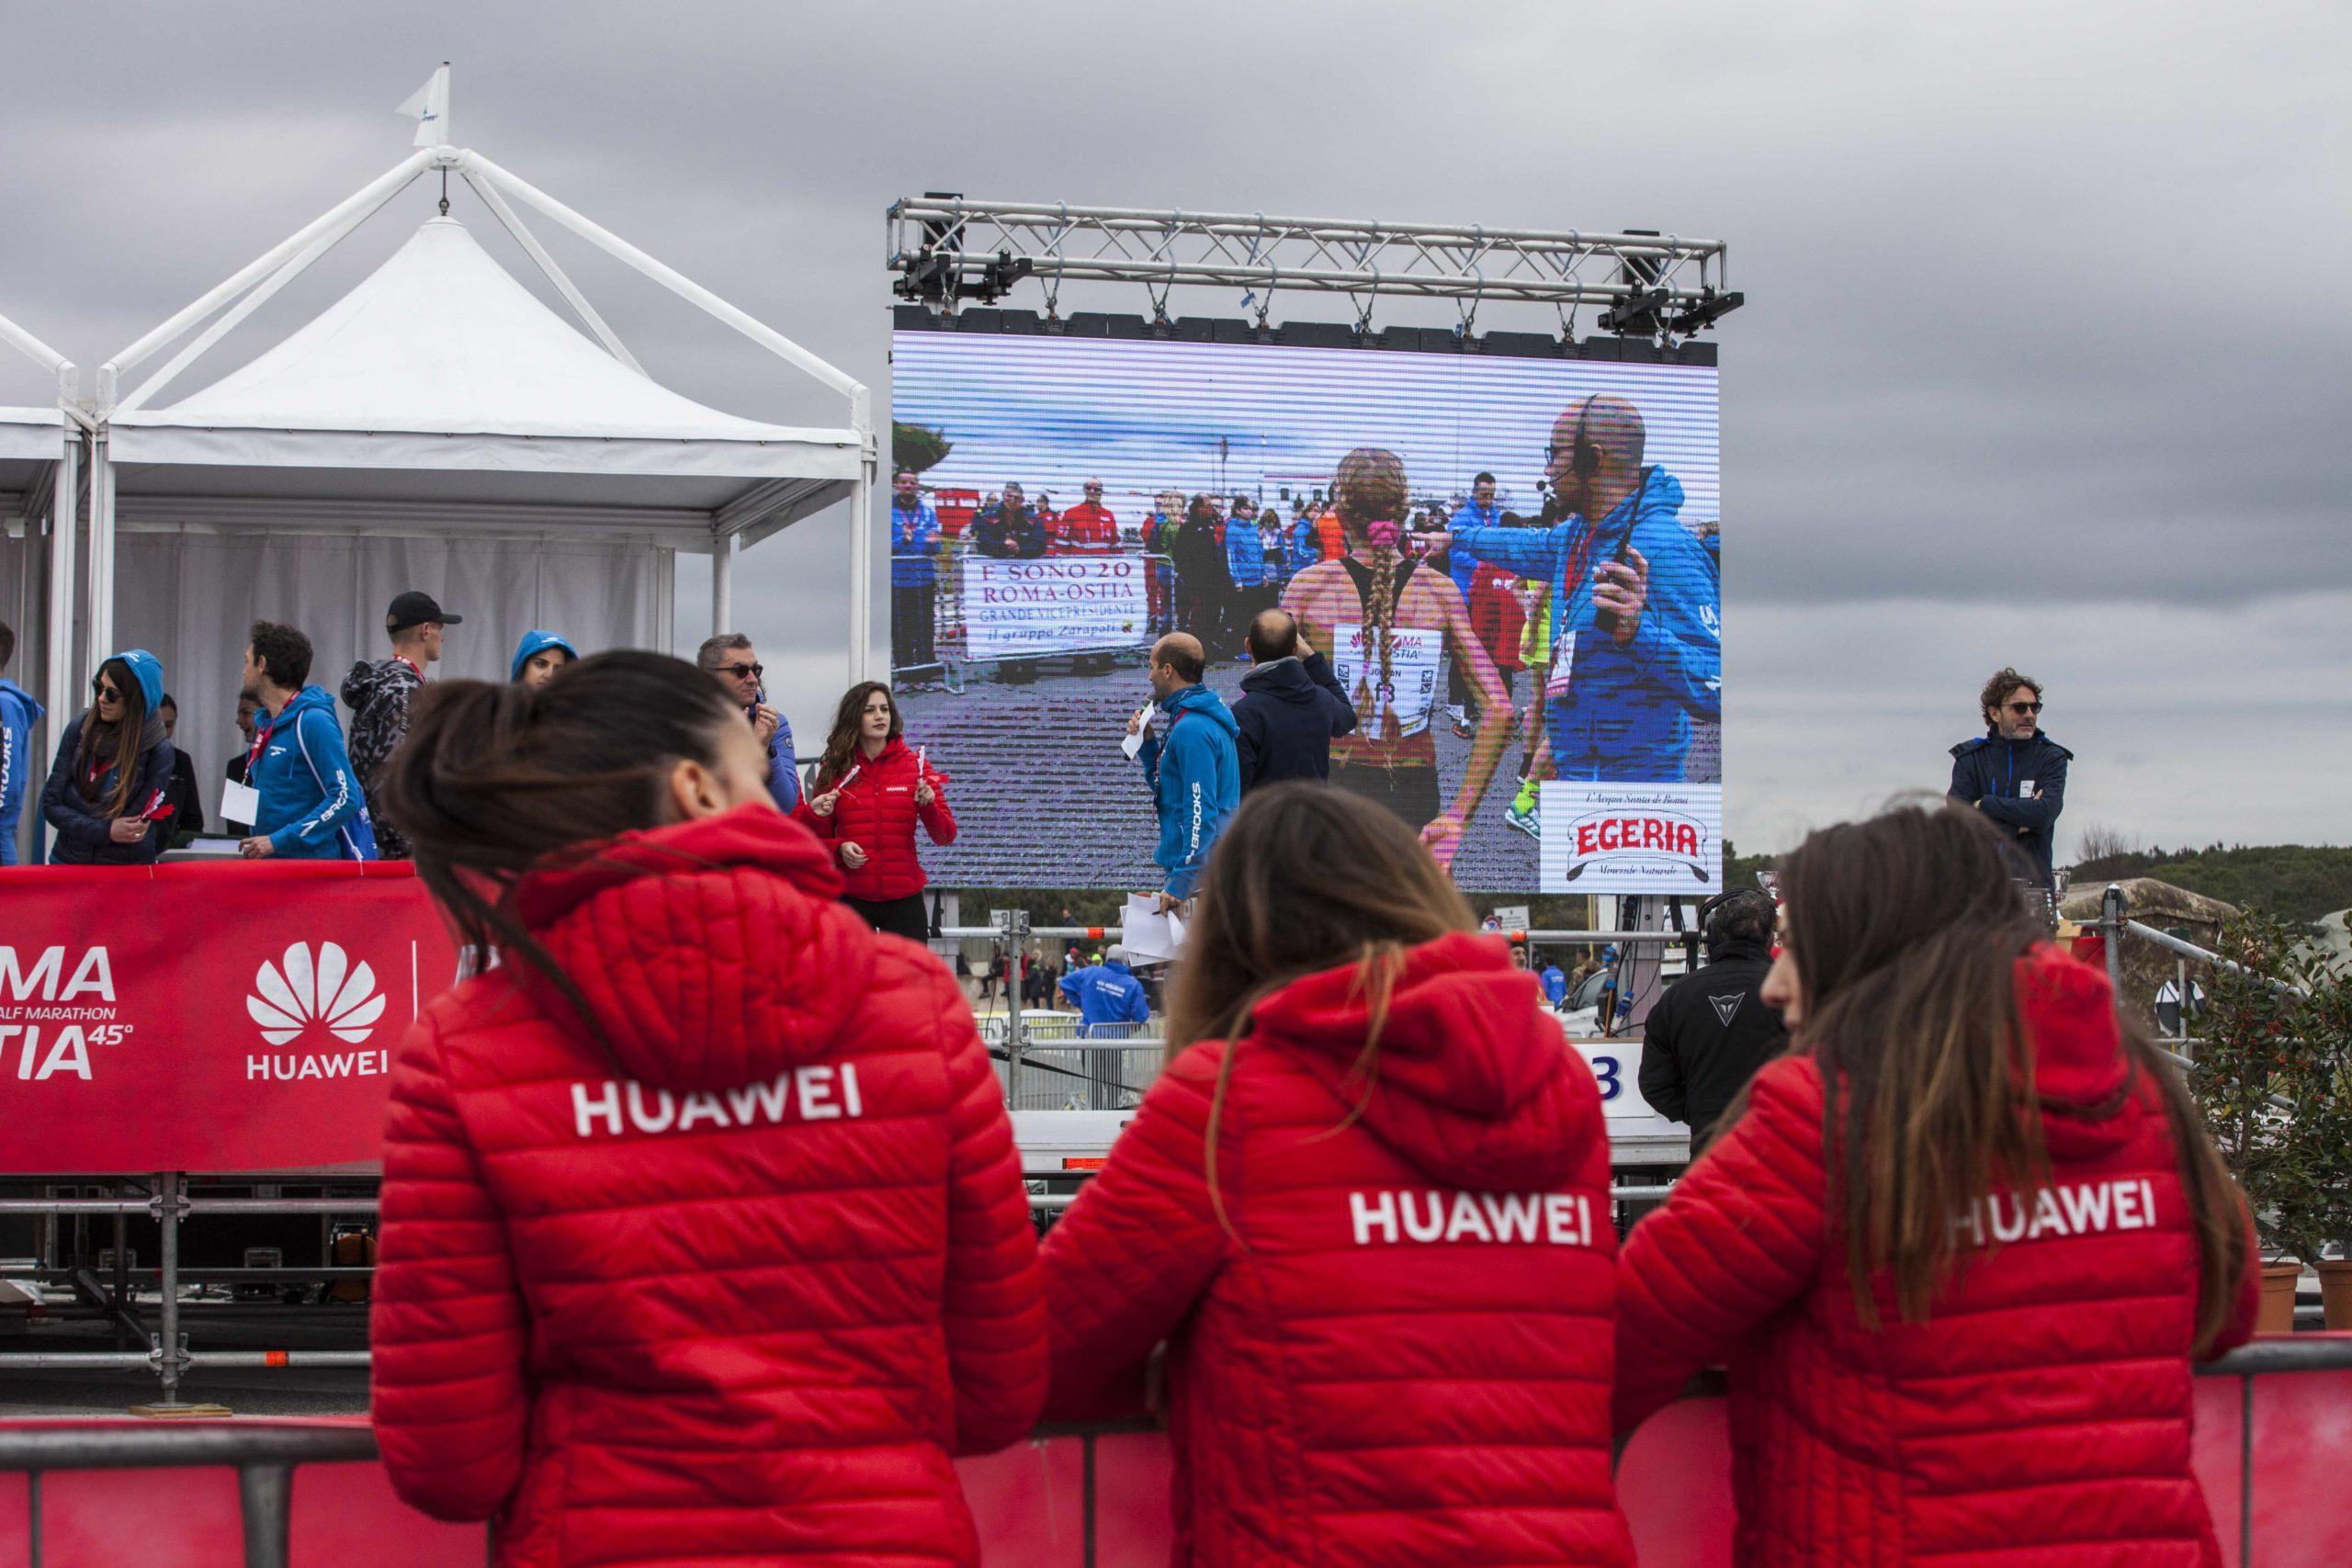 Huawei Marathons staff roma